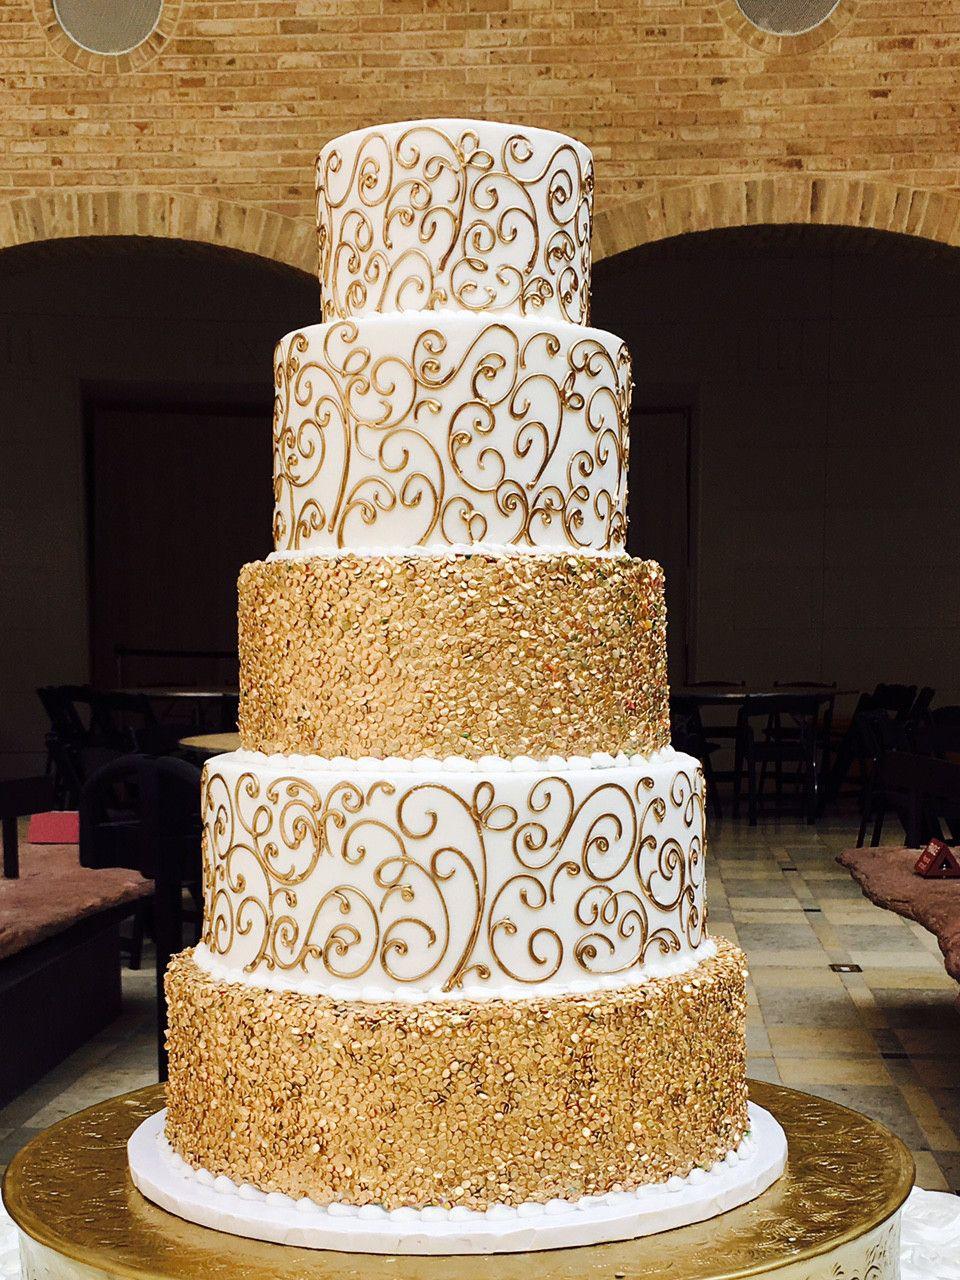 Extravagant Gold Wedding Cake WC068 Confection Perfection Atlanta - Gold Wedding Cakes